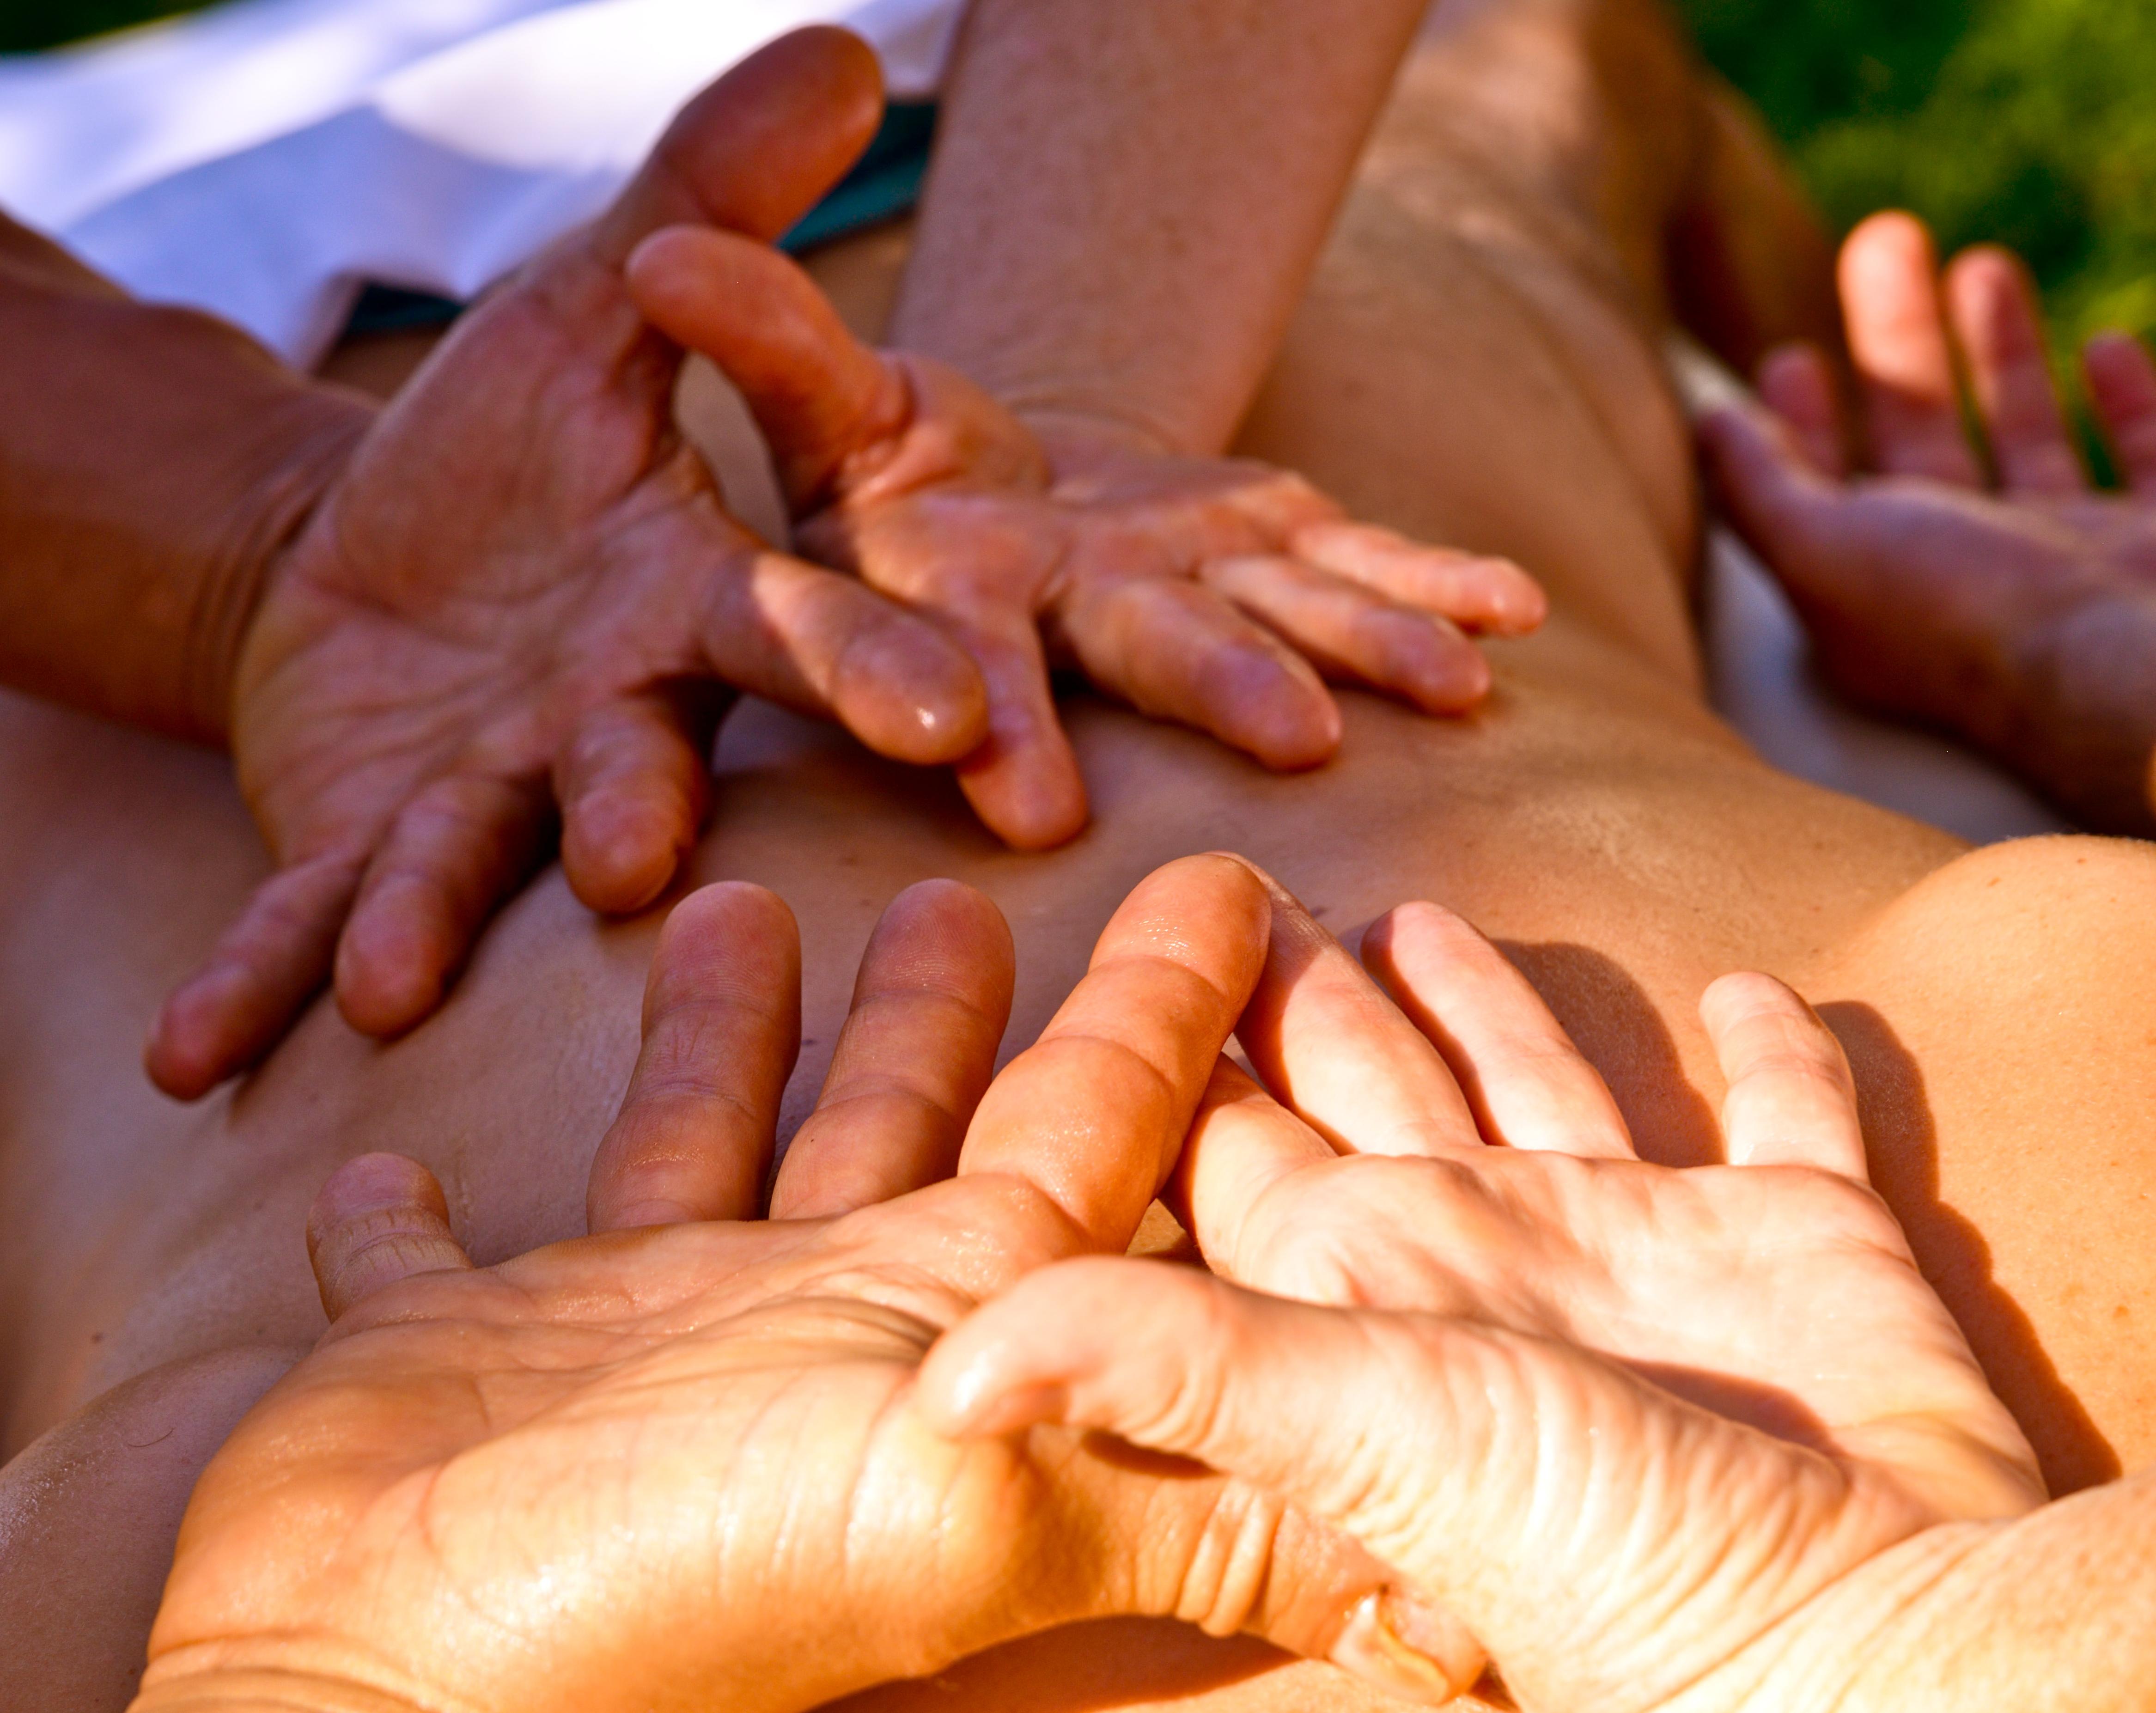 massage 4 mains Var